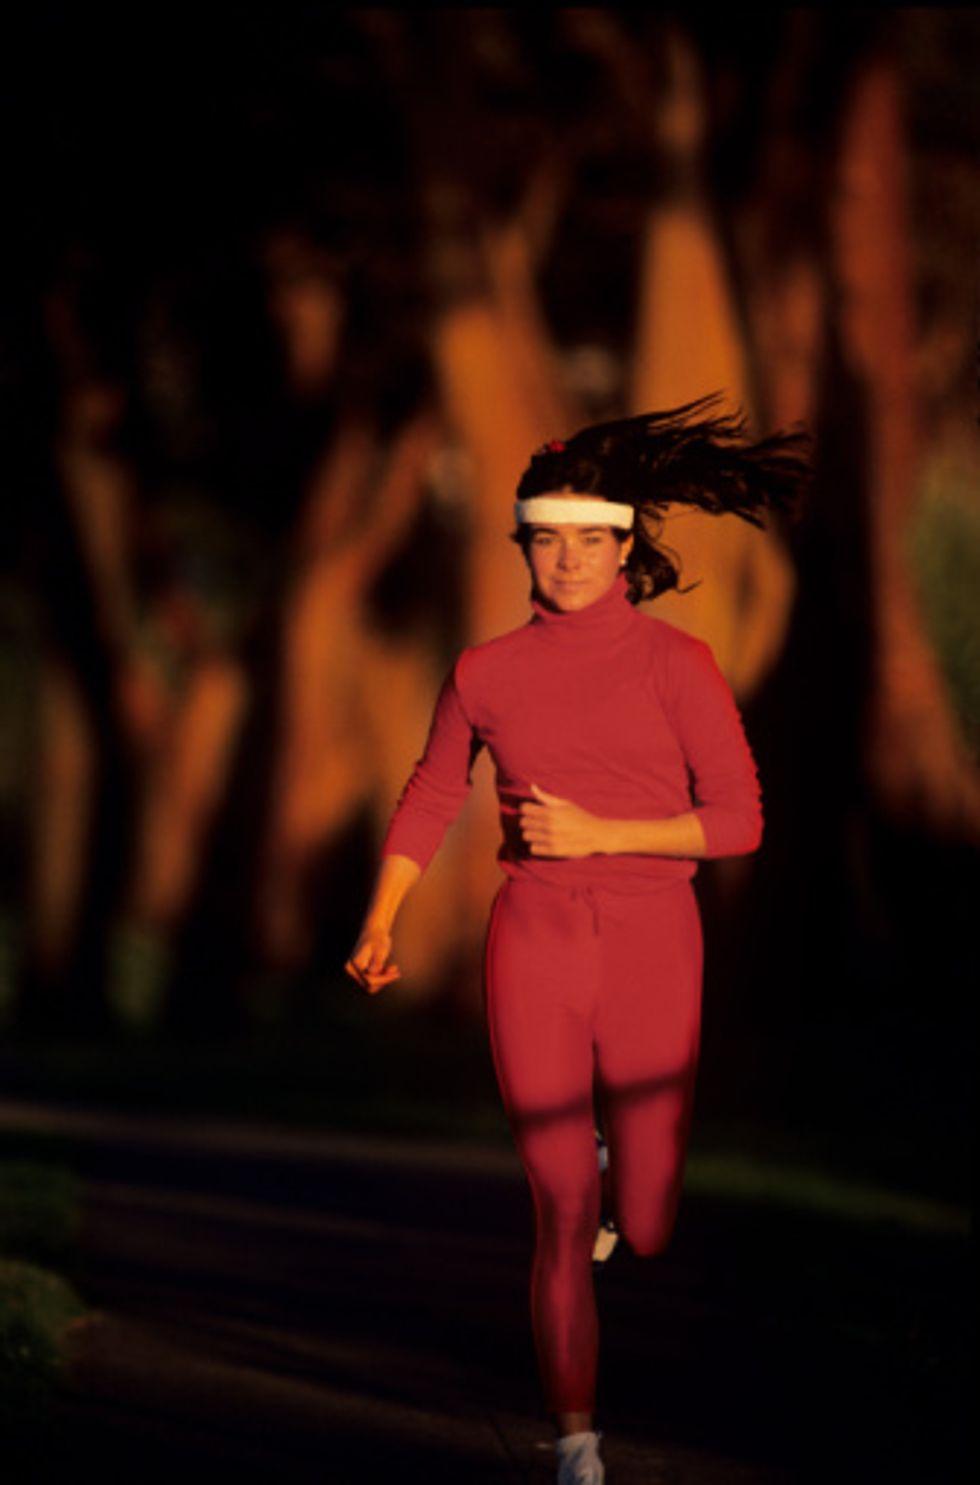 200367973-001-woman-running-709298.jpg